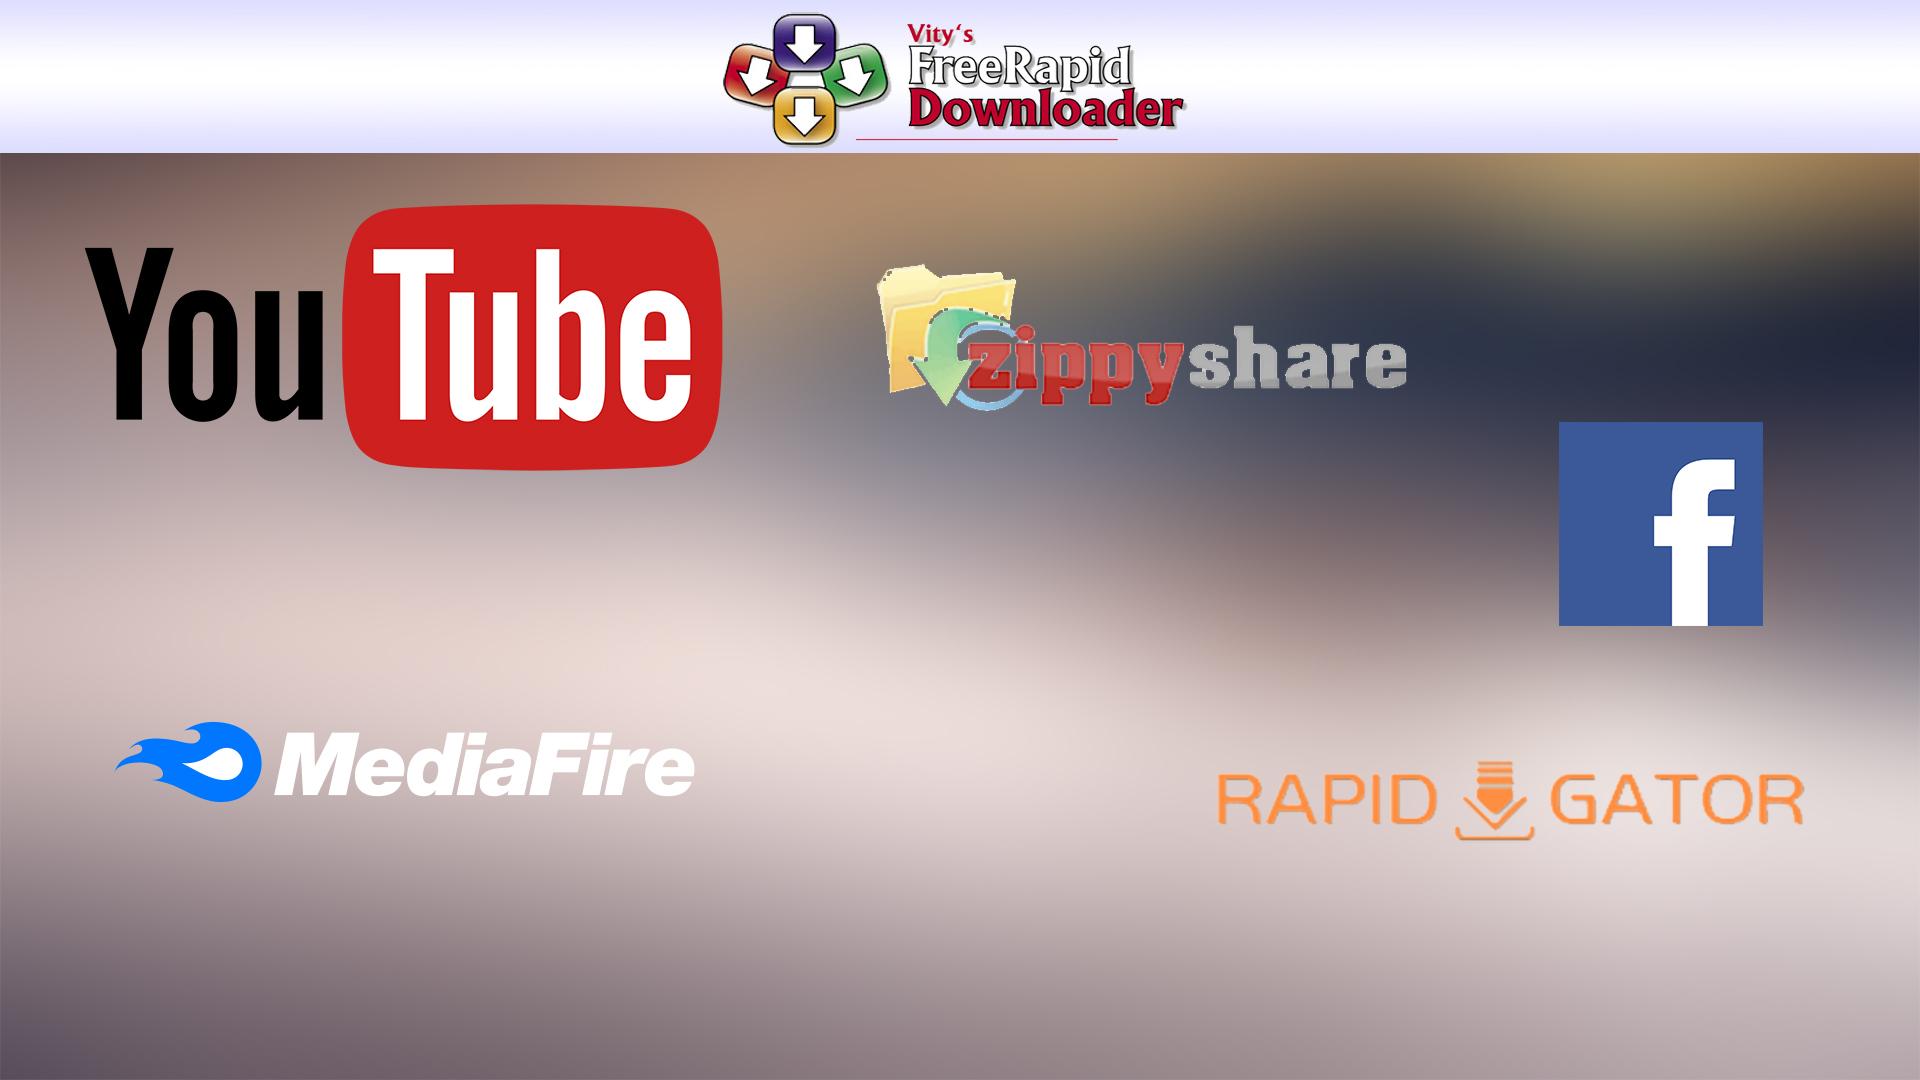 Come scaricare un file da MediaFire, ZippyShare, RapidGator e simili